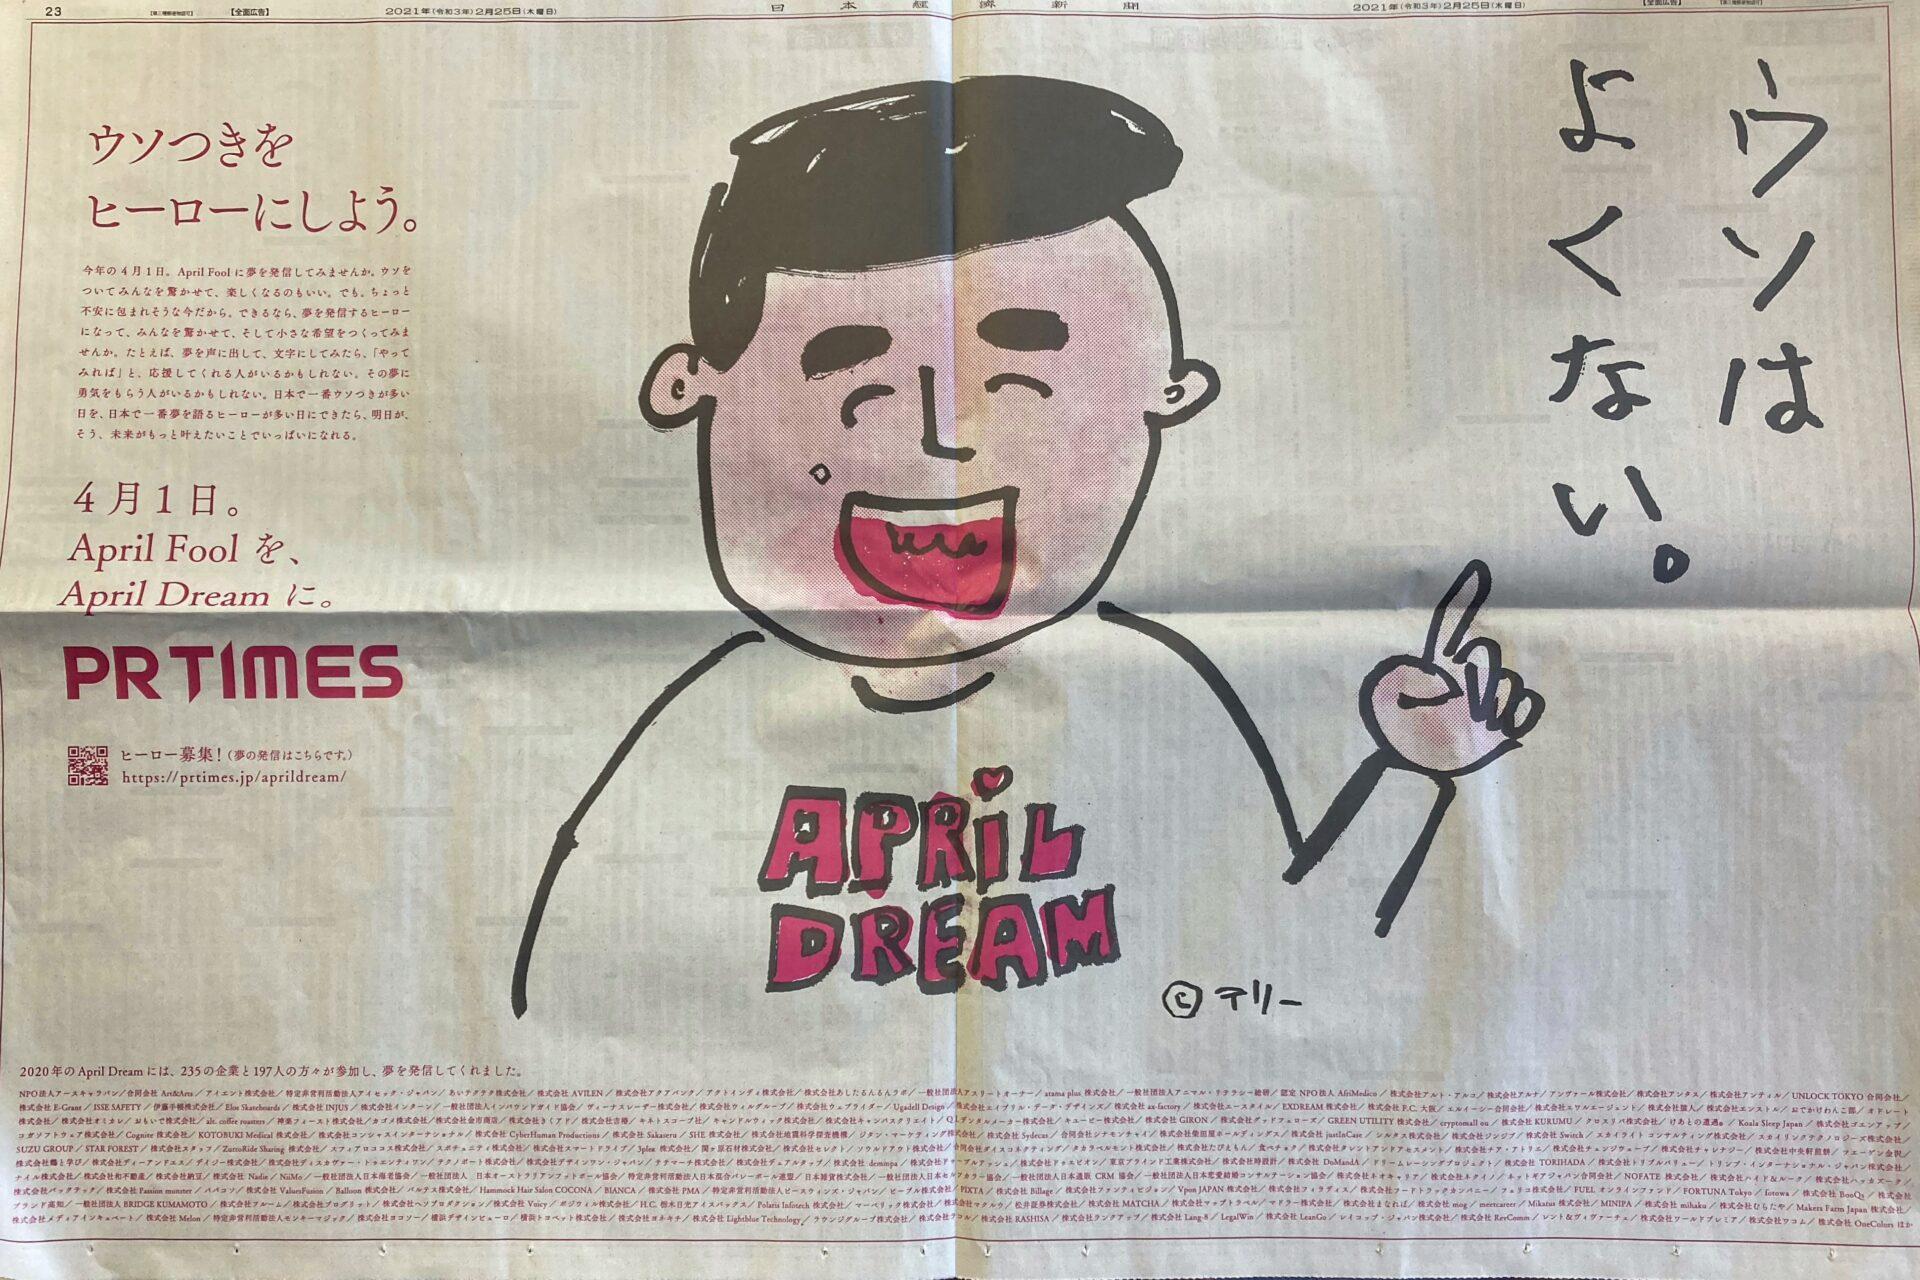 PR TIMES_日経新聞朝刊(全国版)20210225_写真1